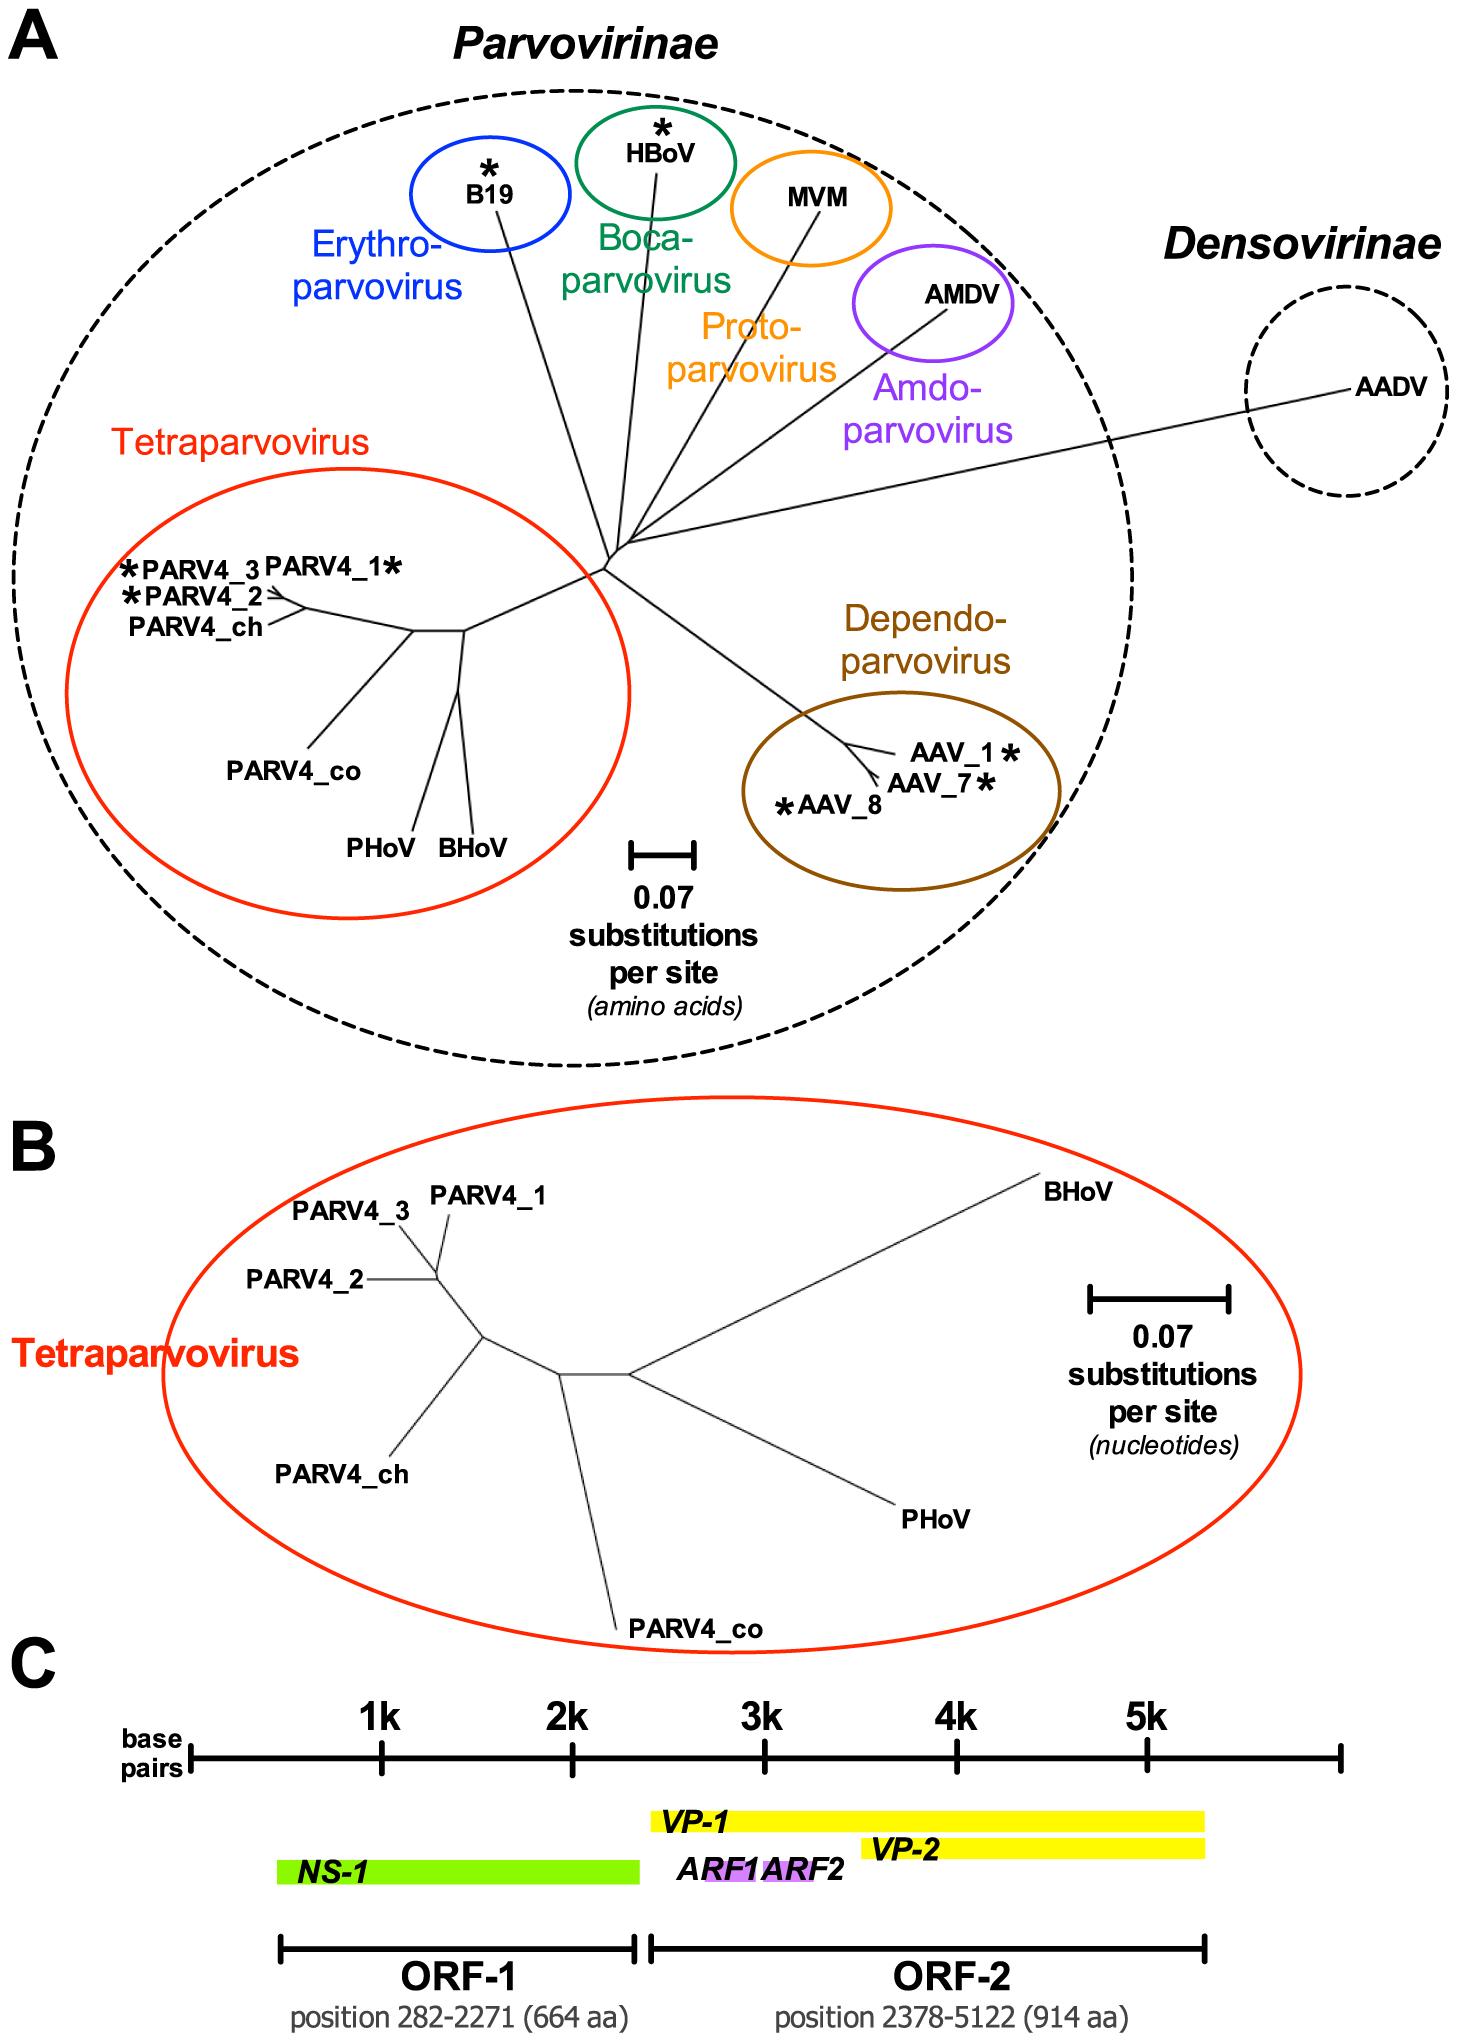 Genetics and genomics of PARV4.